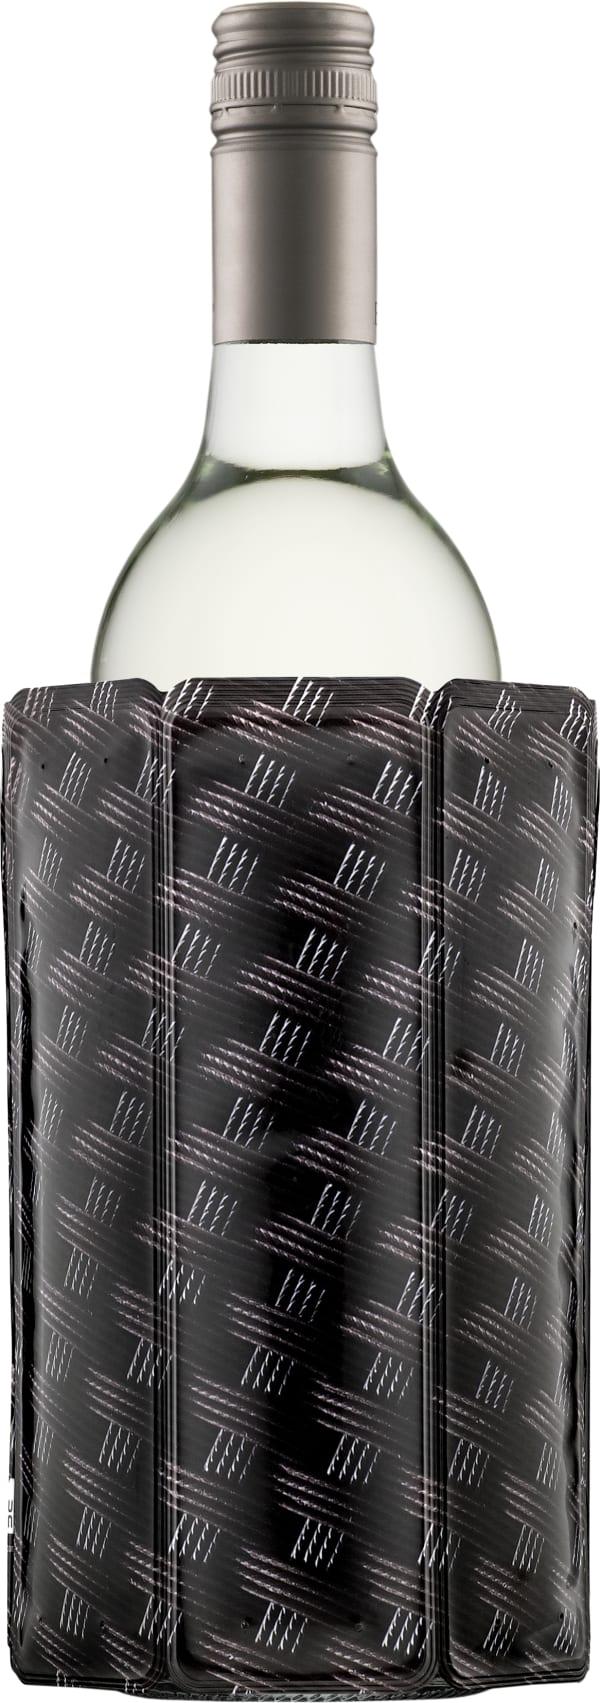 Etiketti wine cooler